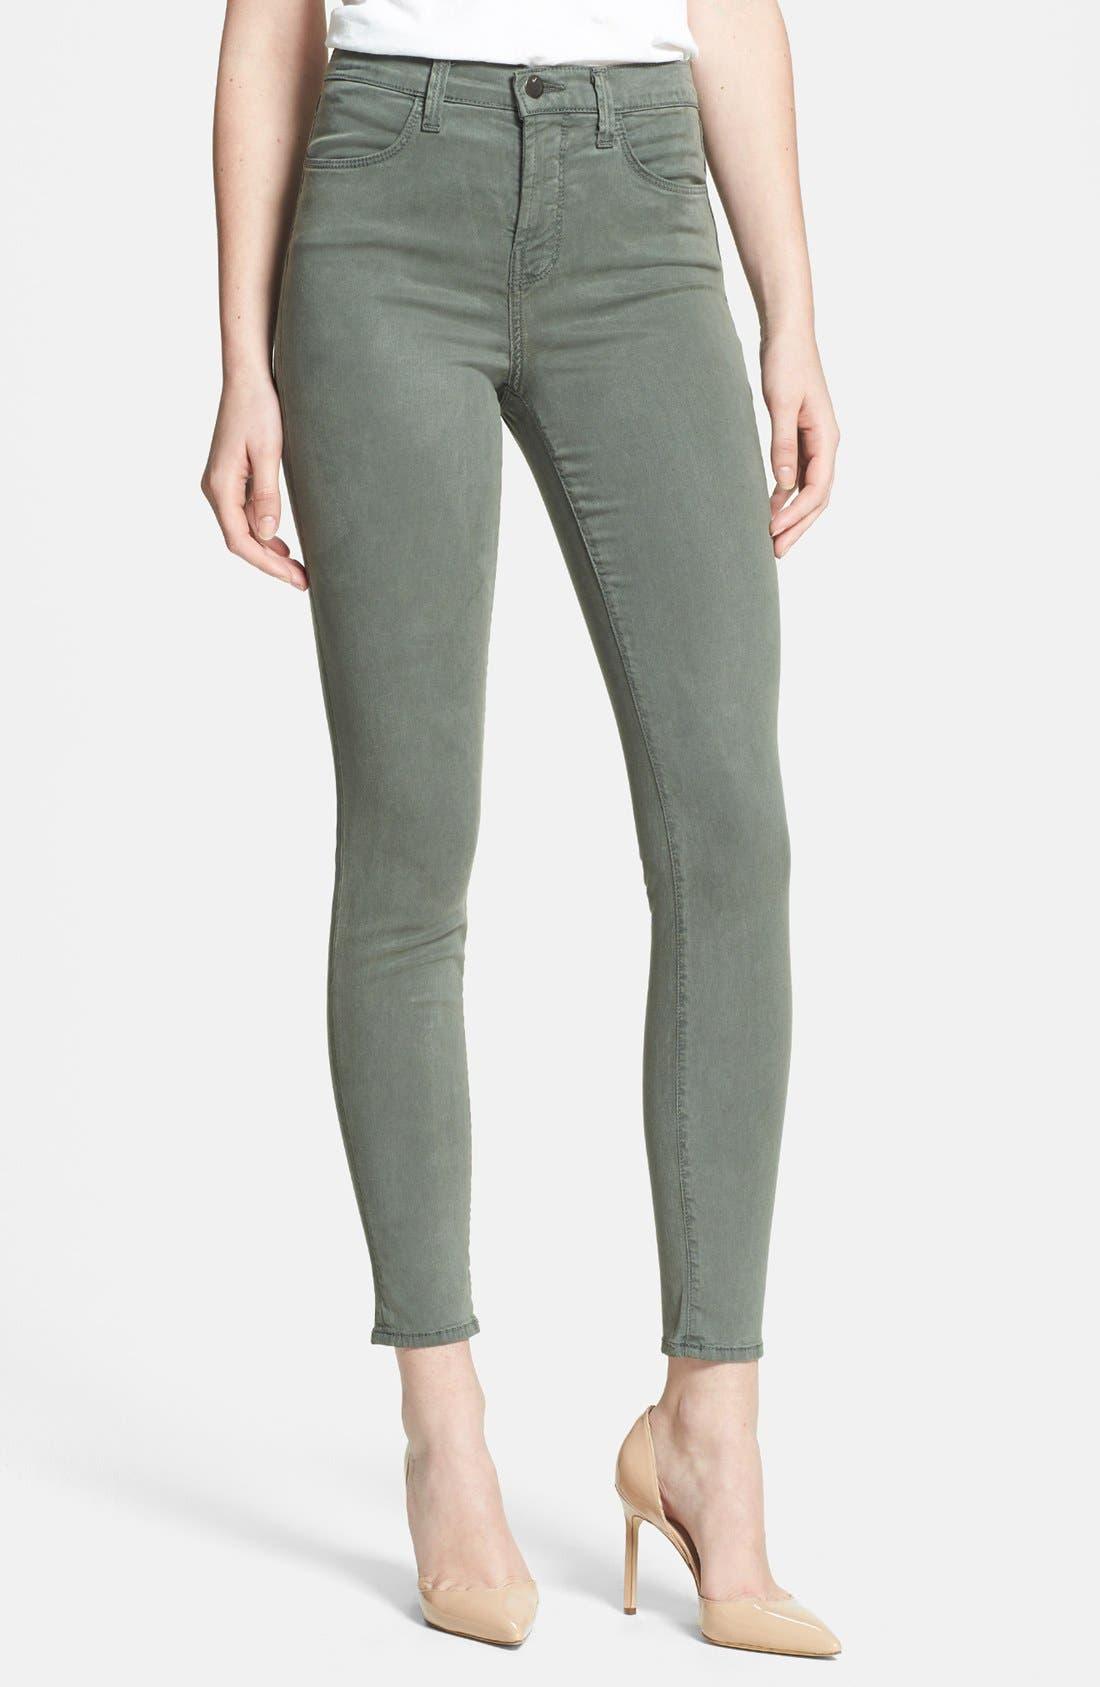 Main Image - J Brand 'Maria 2311' High Rise Skinny Jeans (Sprucestone)